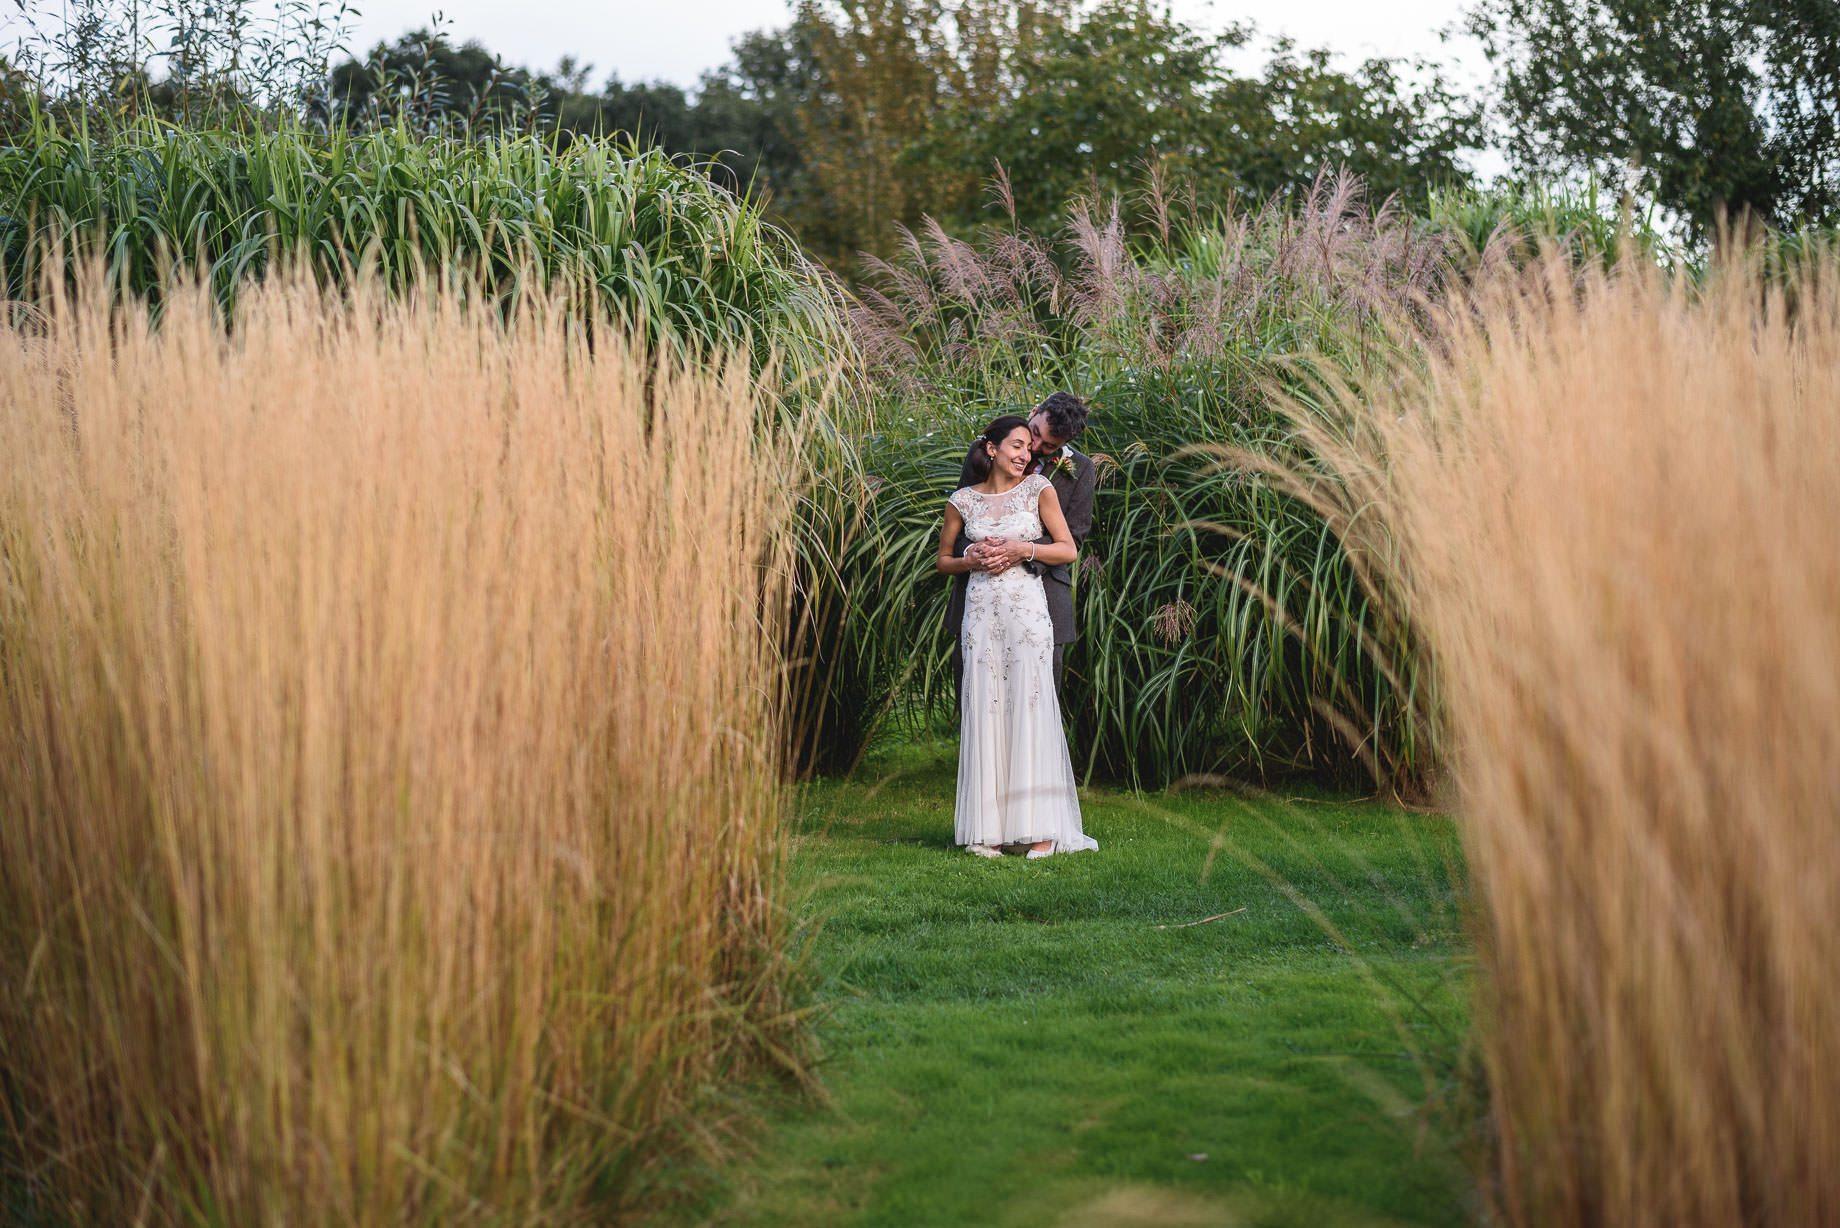 Bury Court Barn wedding photography - Nadia + Tom